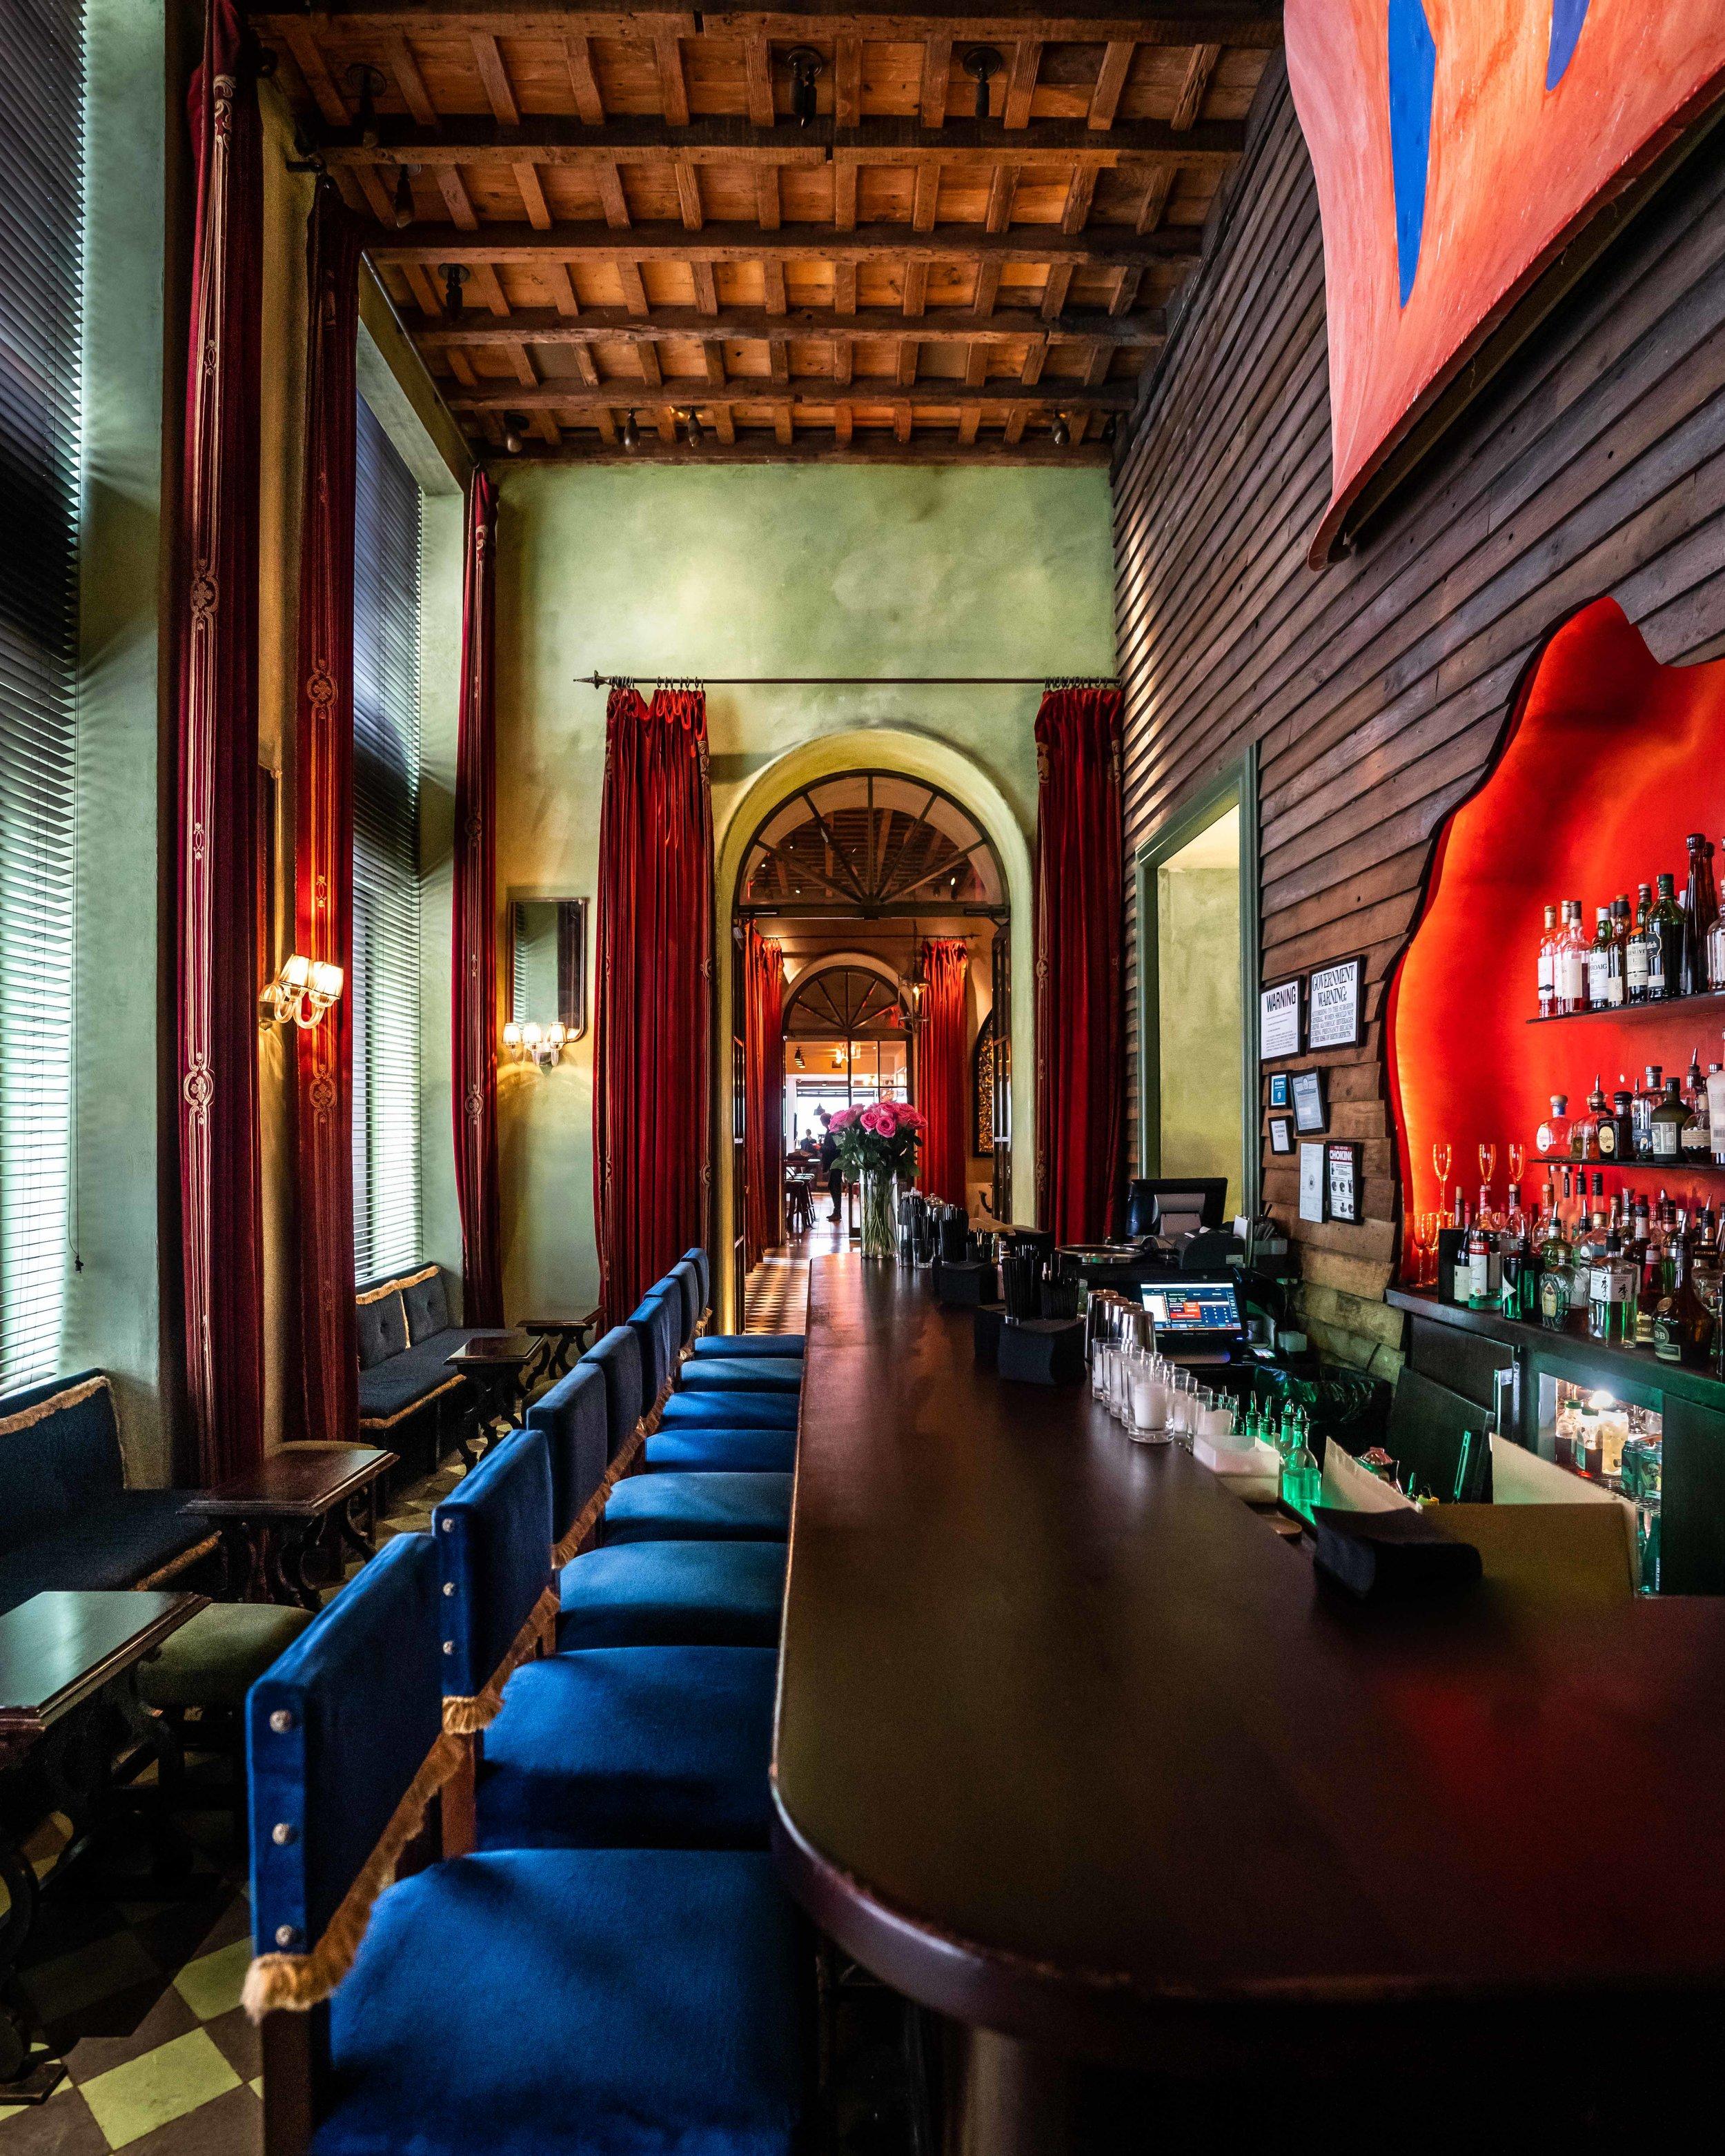 joe-thomas-photographer-new-york-city-gramercy-park-hotel-1.jpg